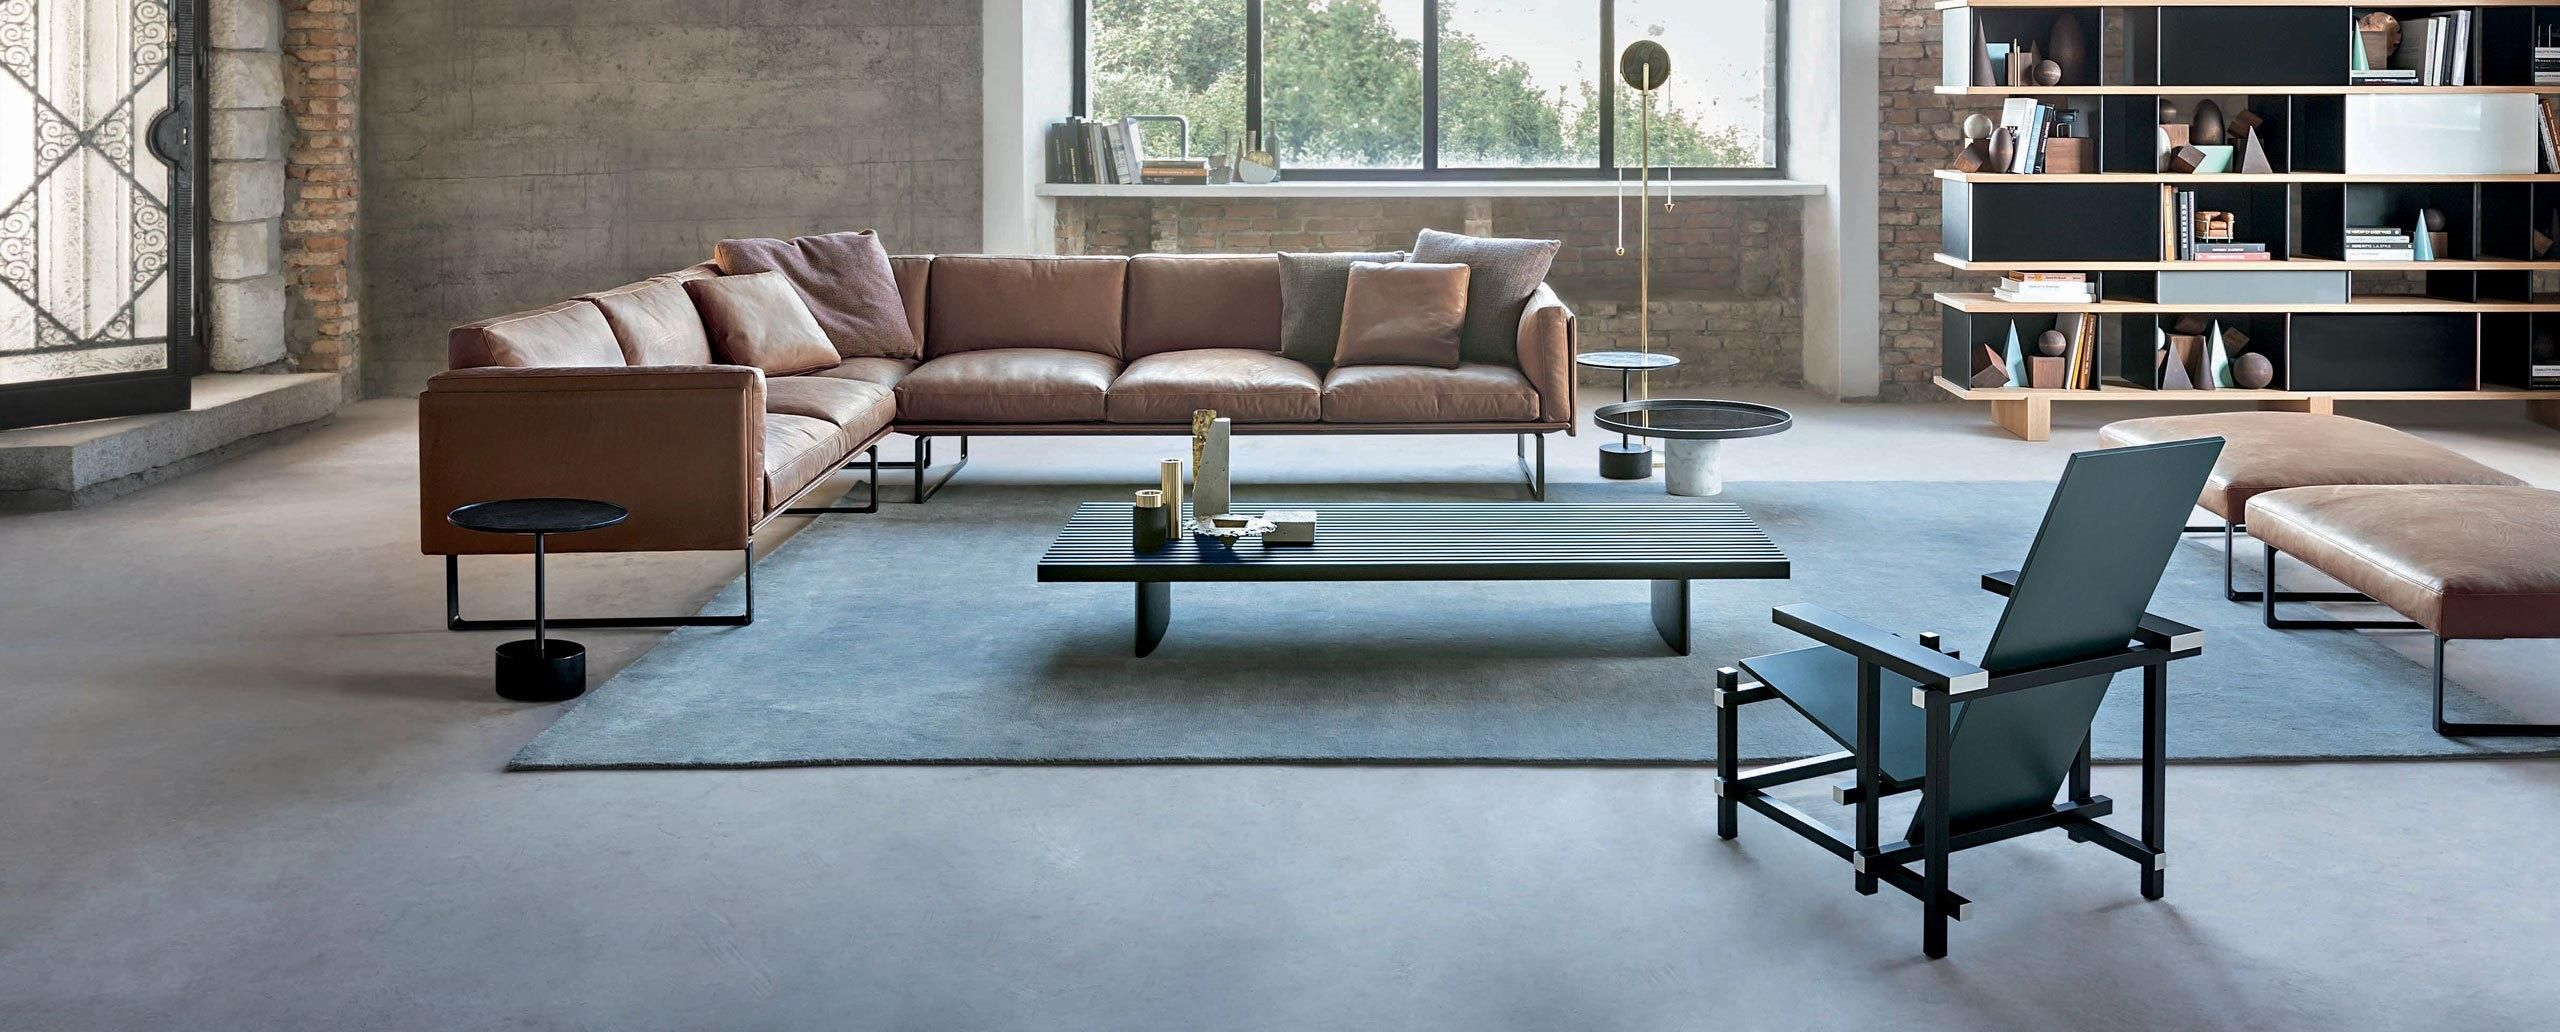 c8aac19fc7564022f08f0e17704f571f Incroyable De Table Basse Le Corbusier Concept